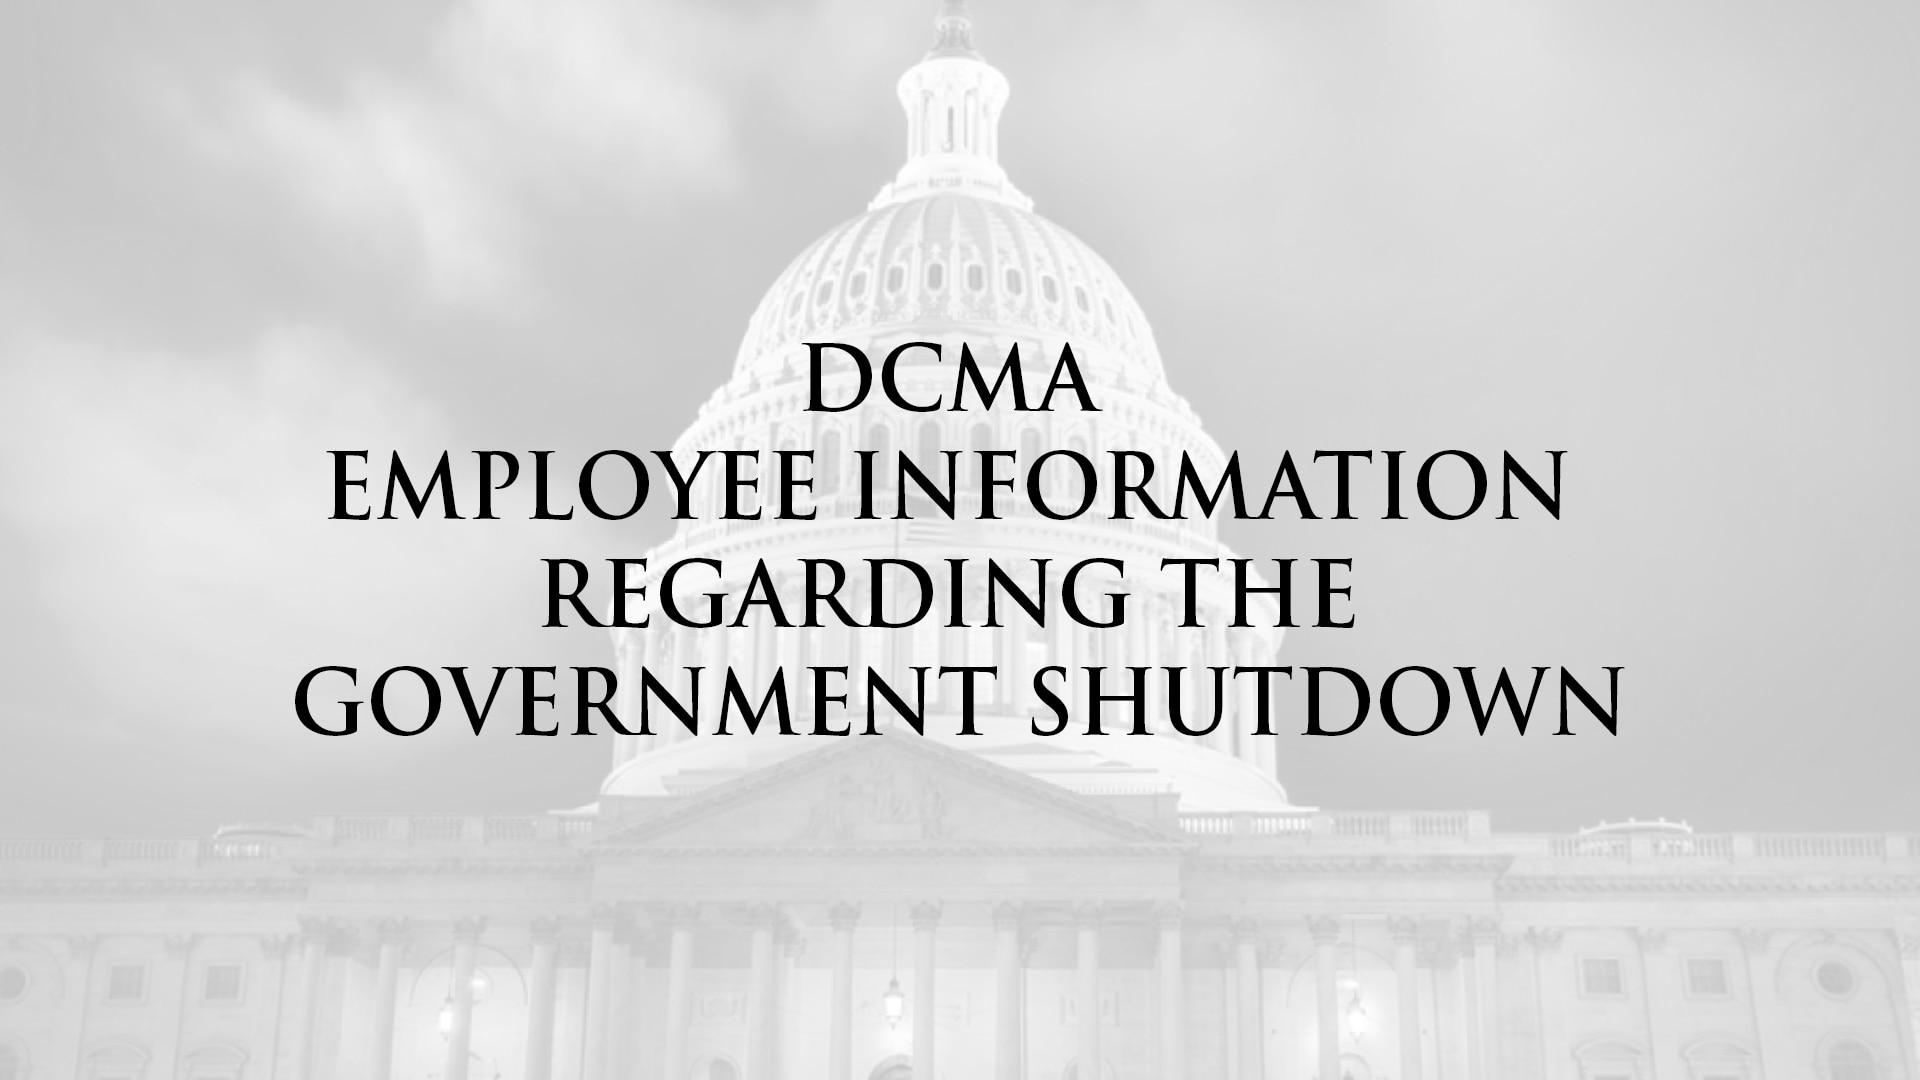 DCMA Employee information regarding the January 2018 government shutdown.